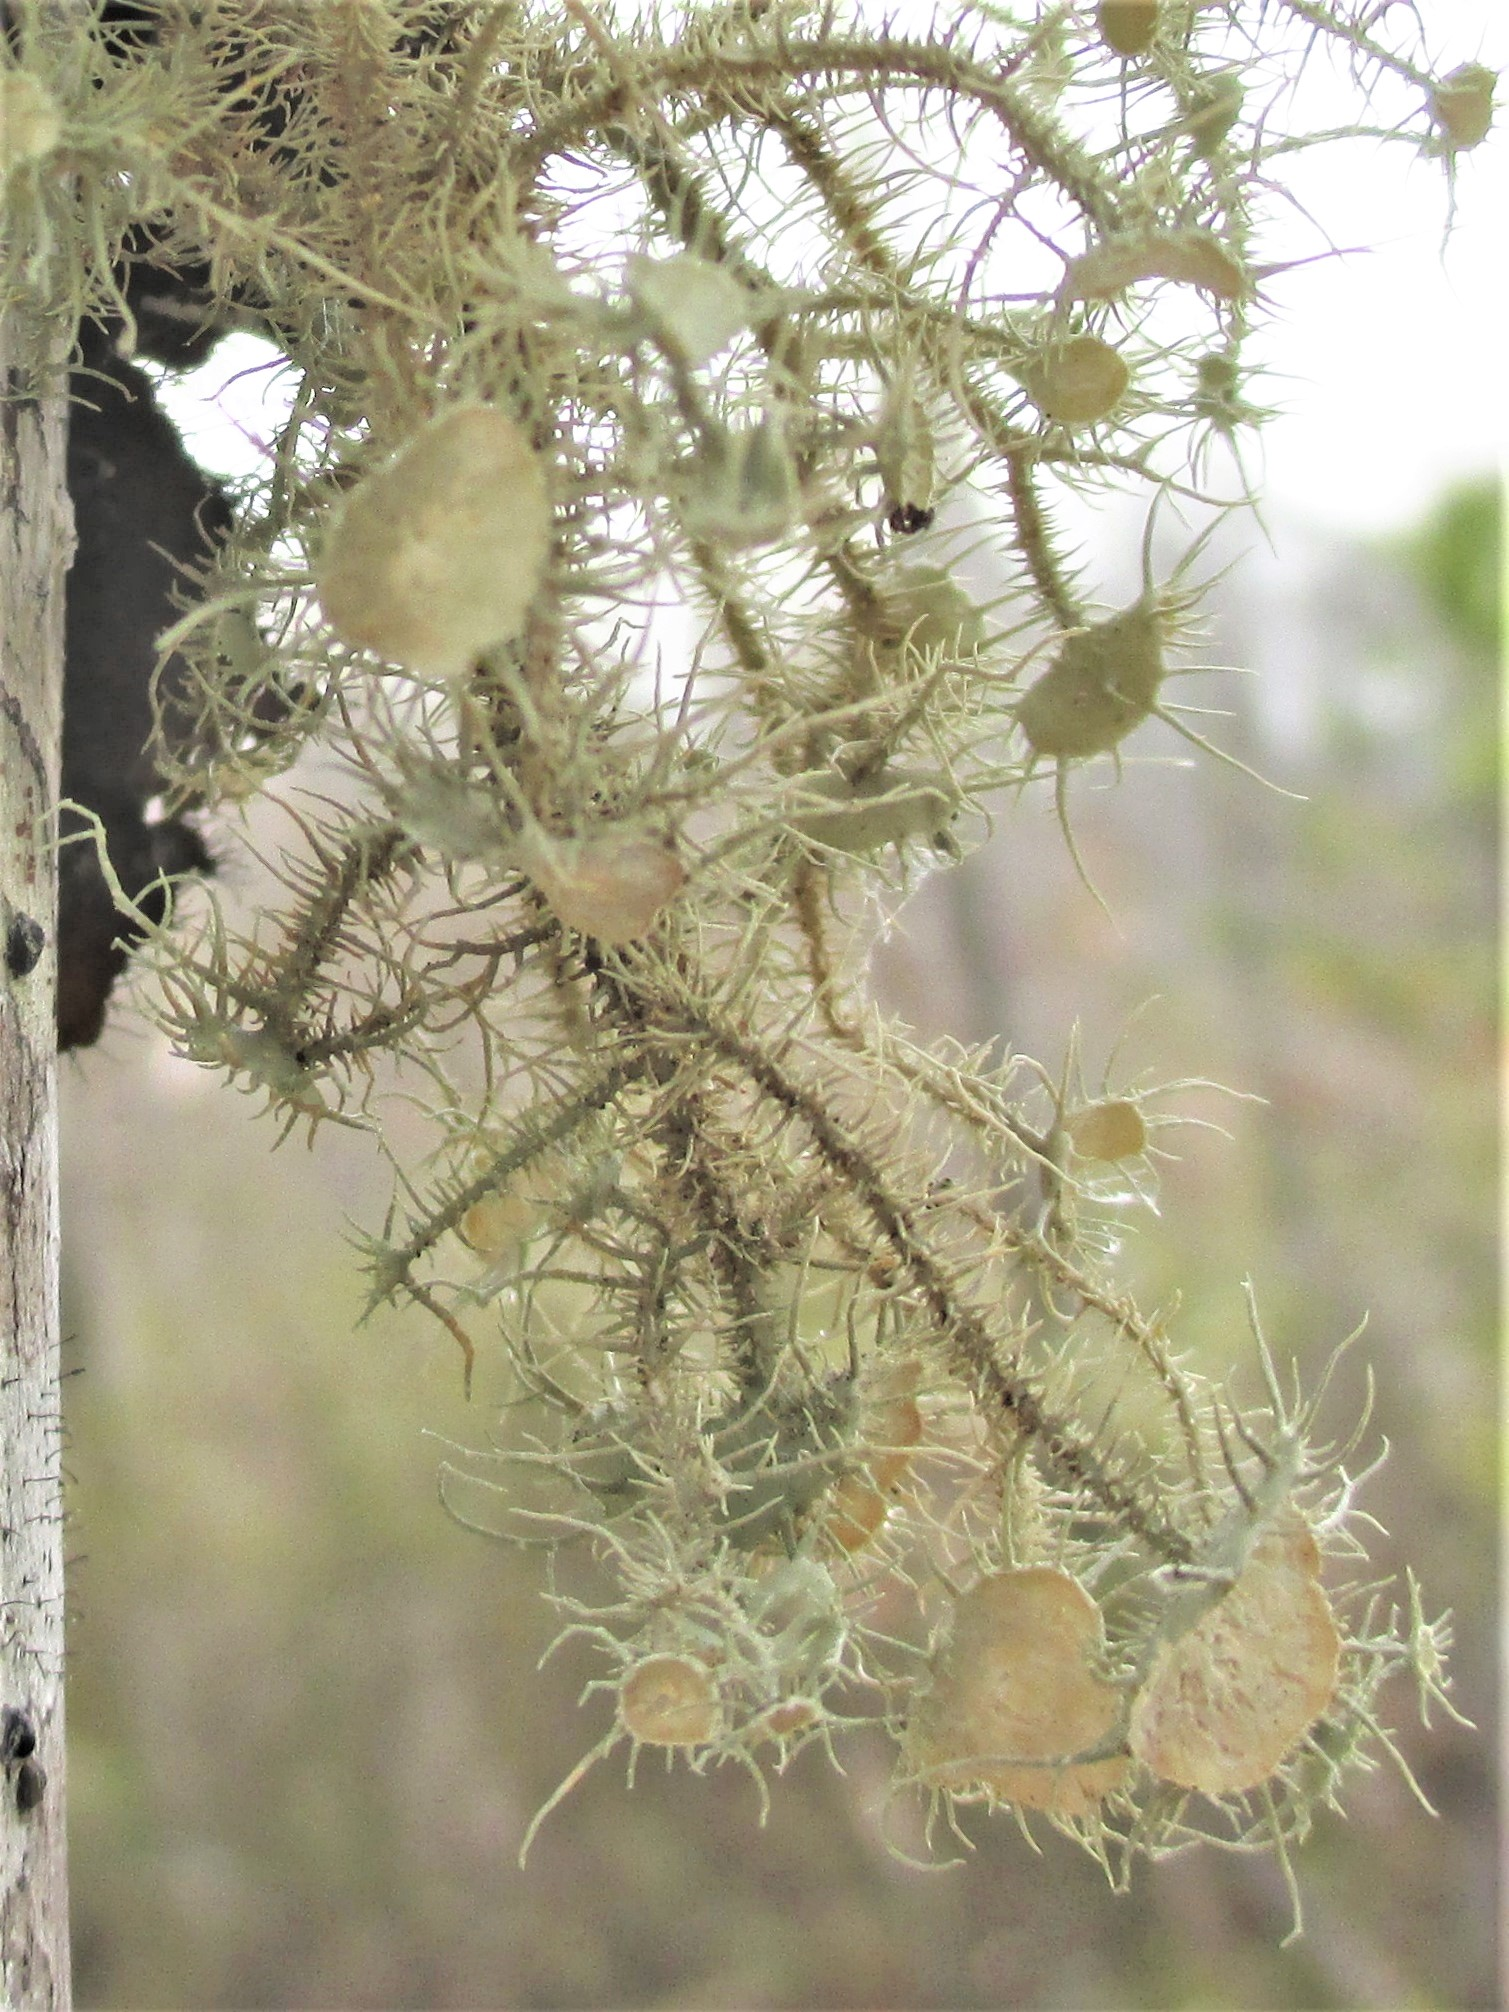 Bushy Beard Lichen (Usnea strigosa)